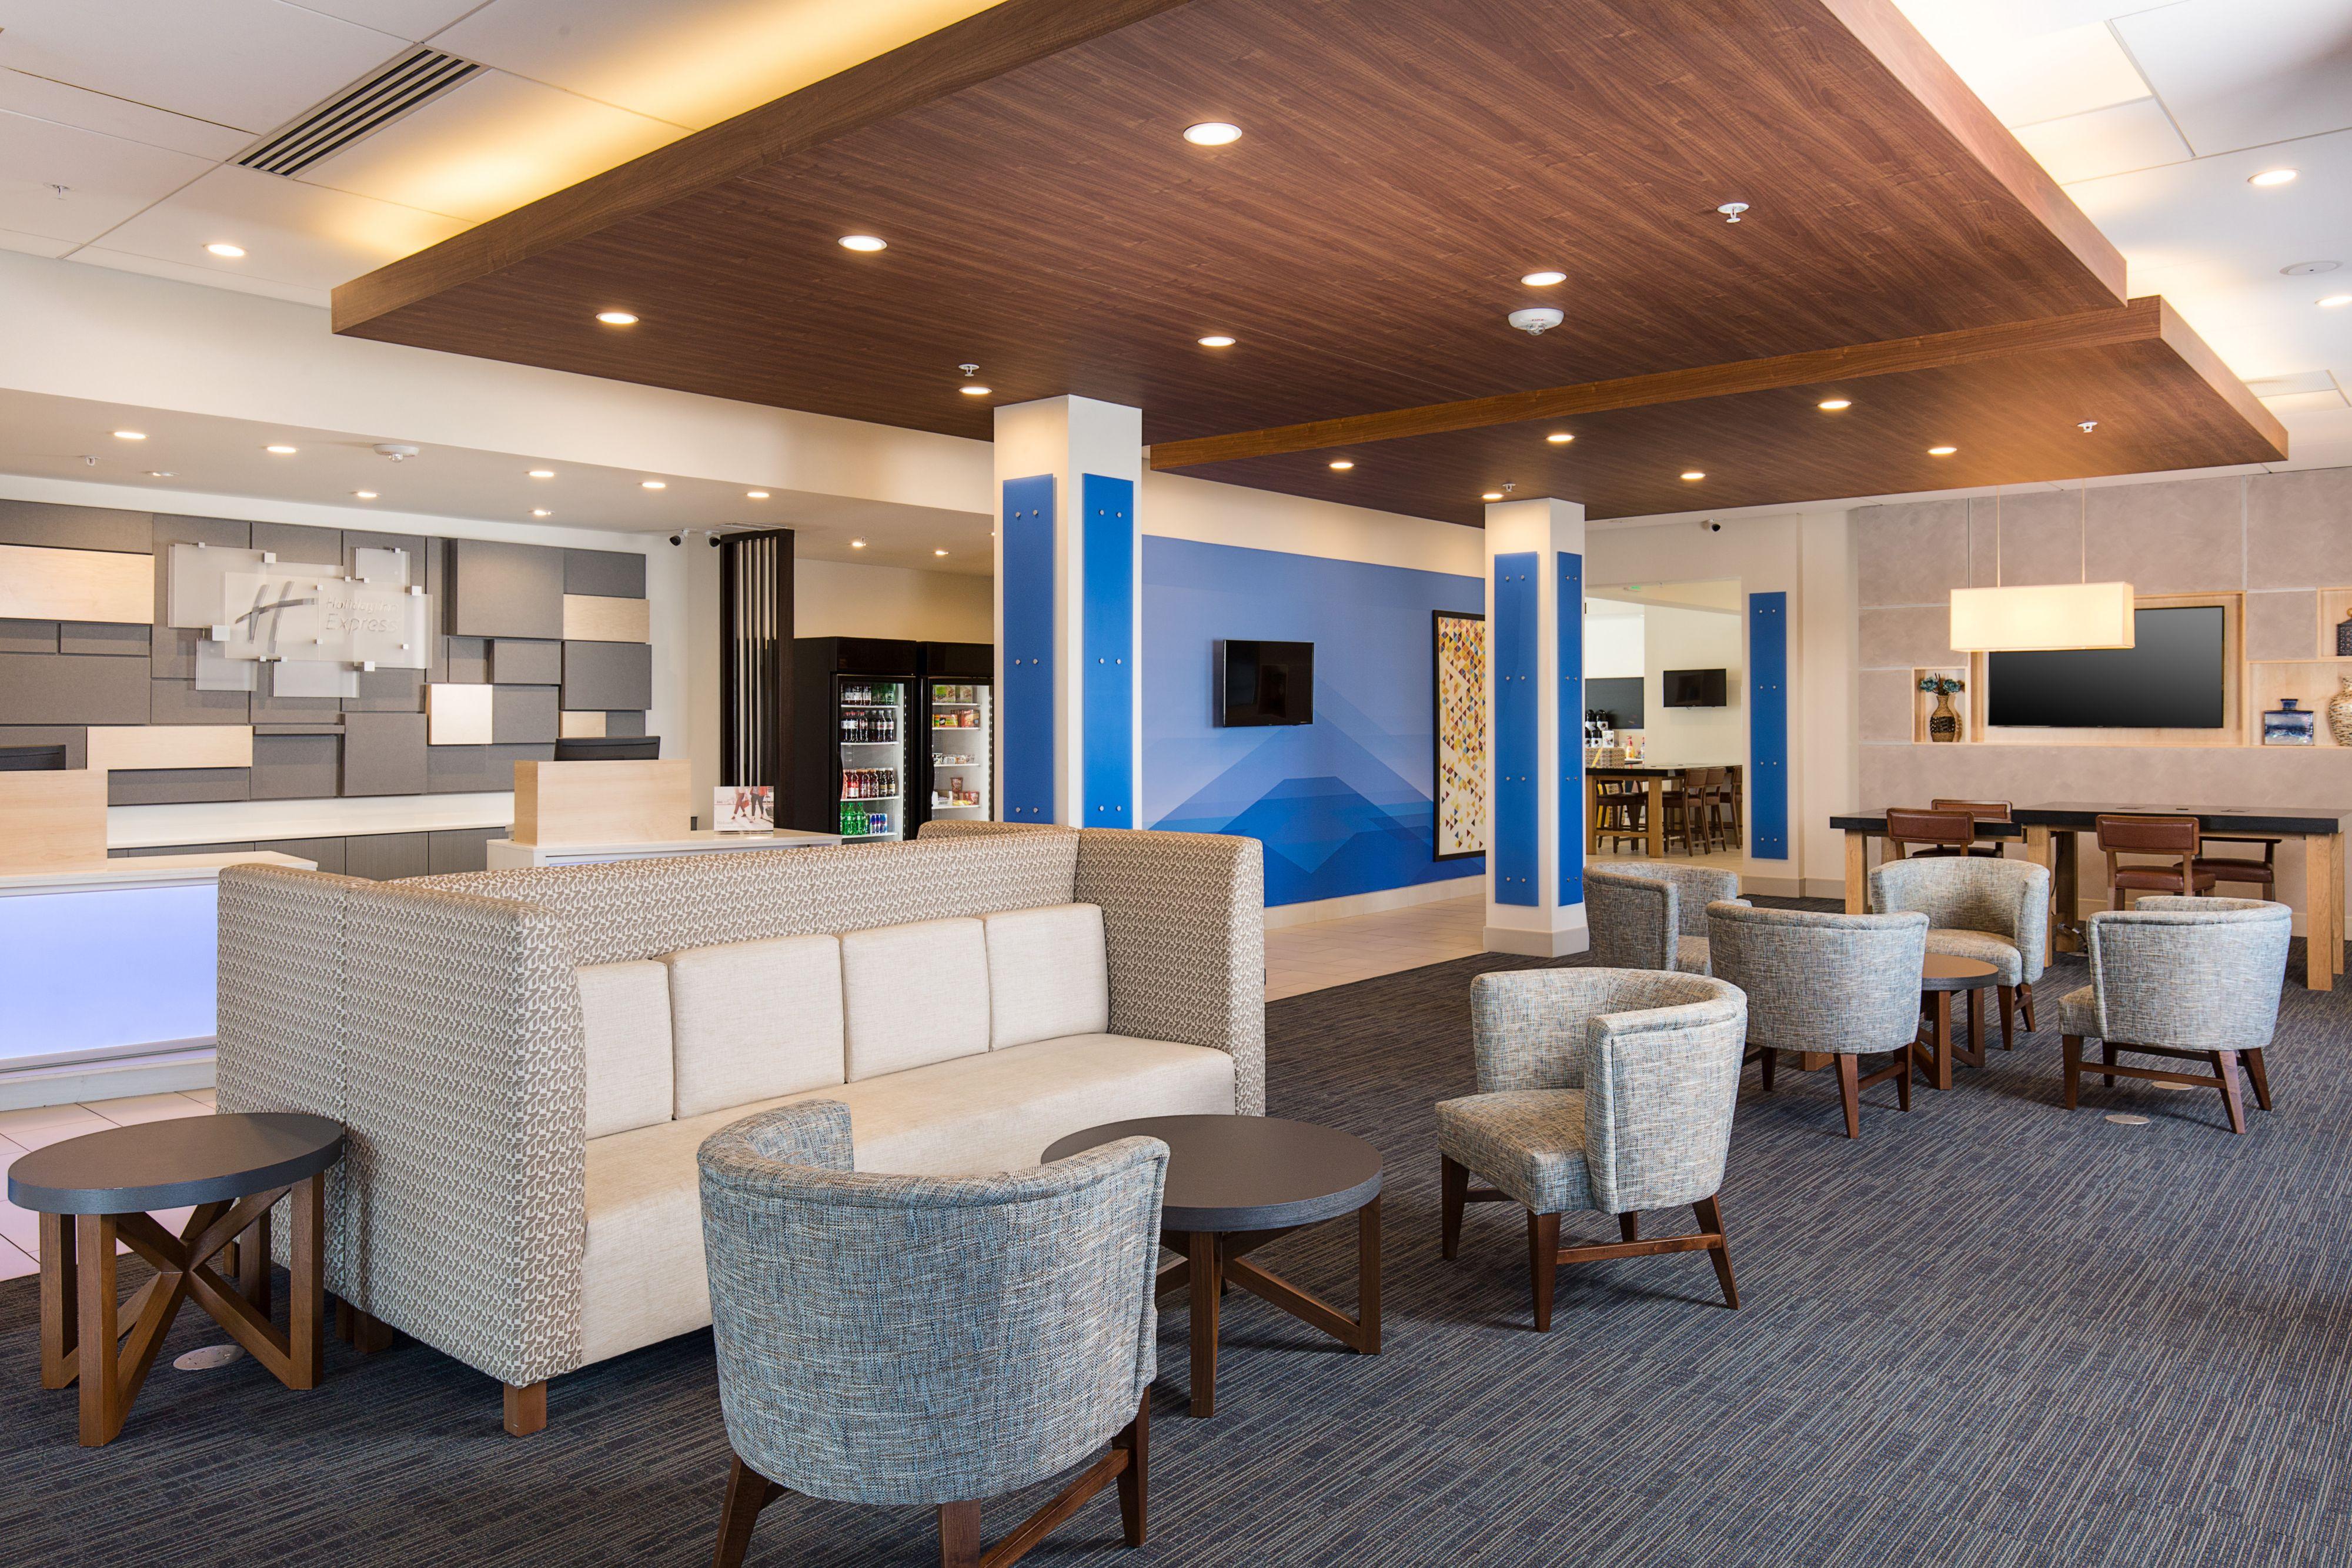 Holiday Inn Express Visalia image 4